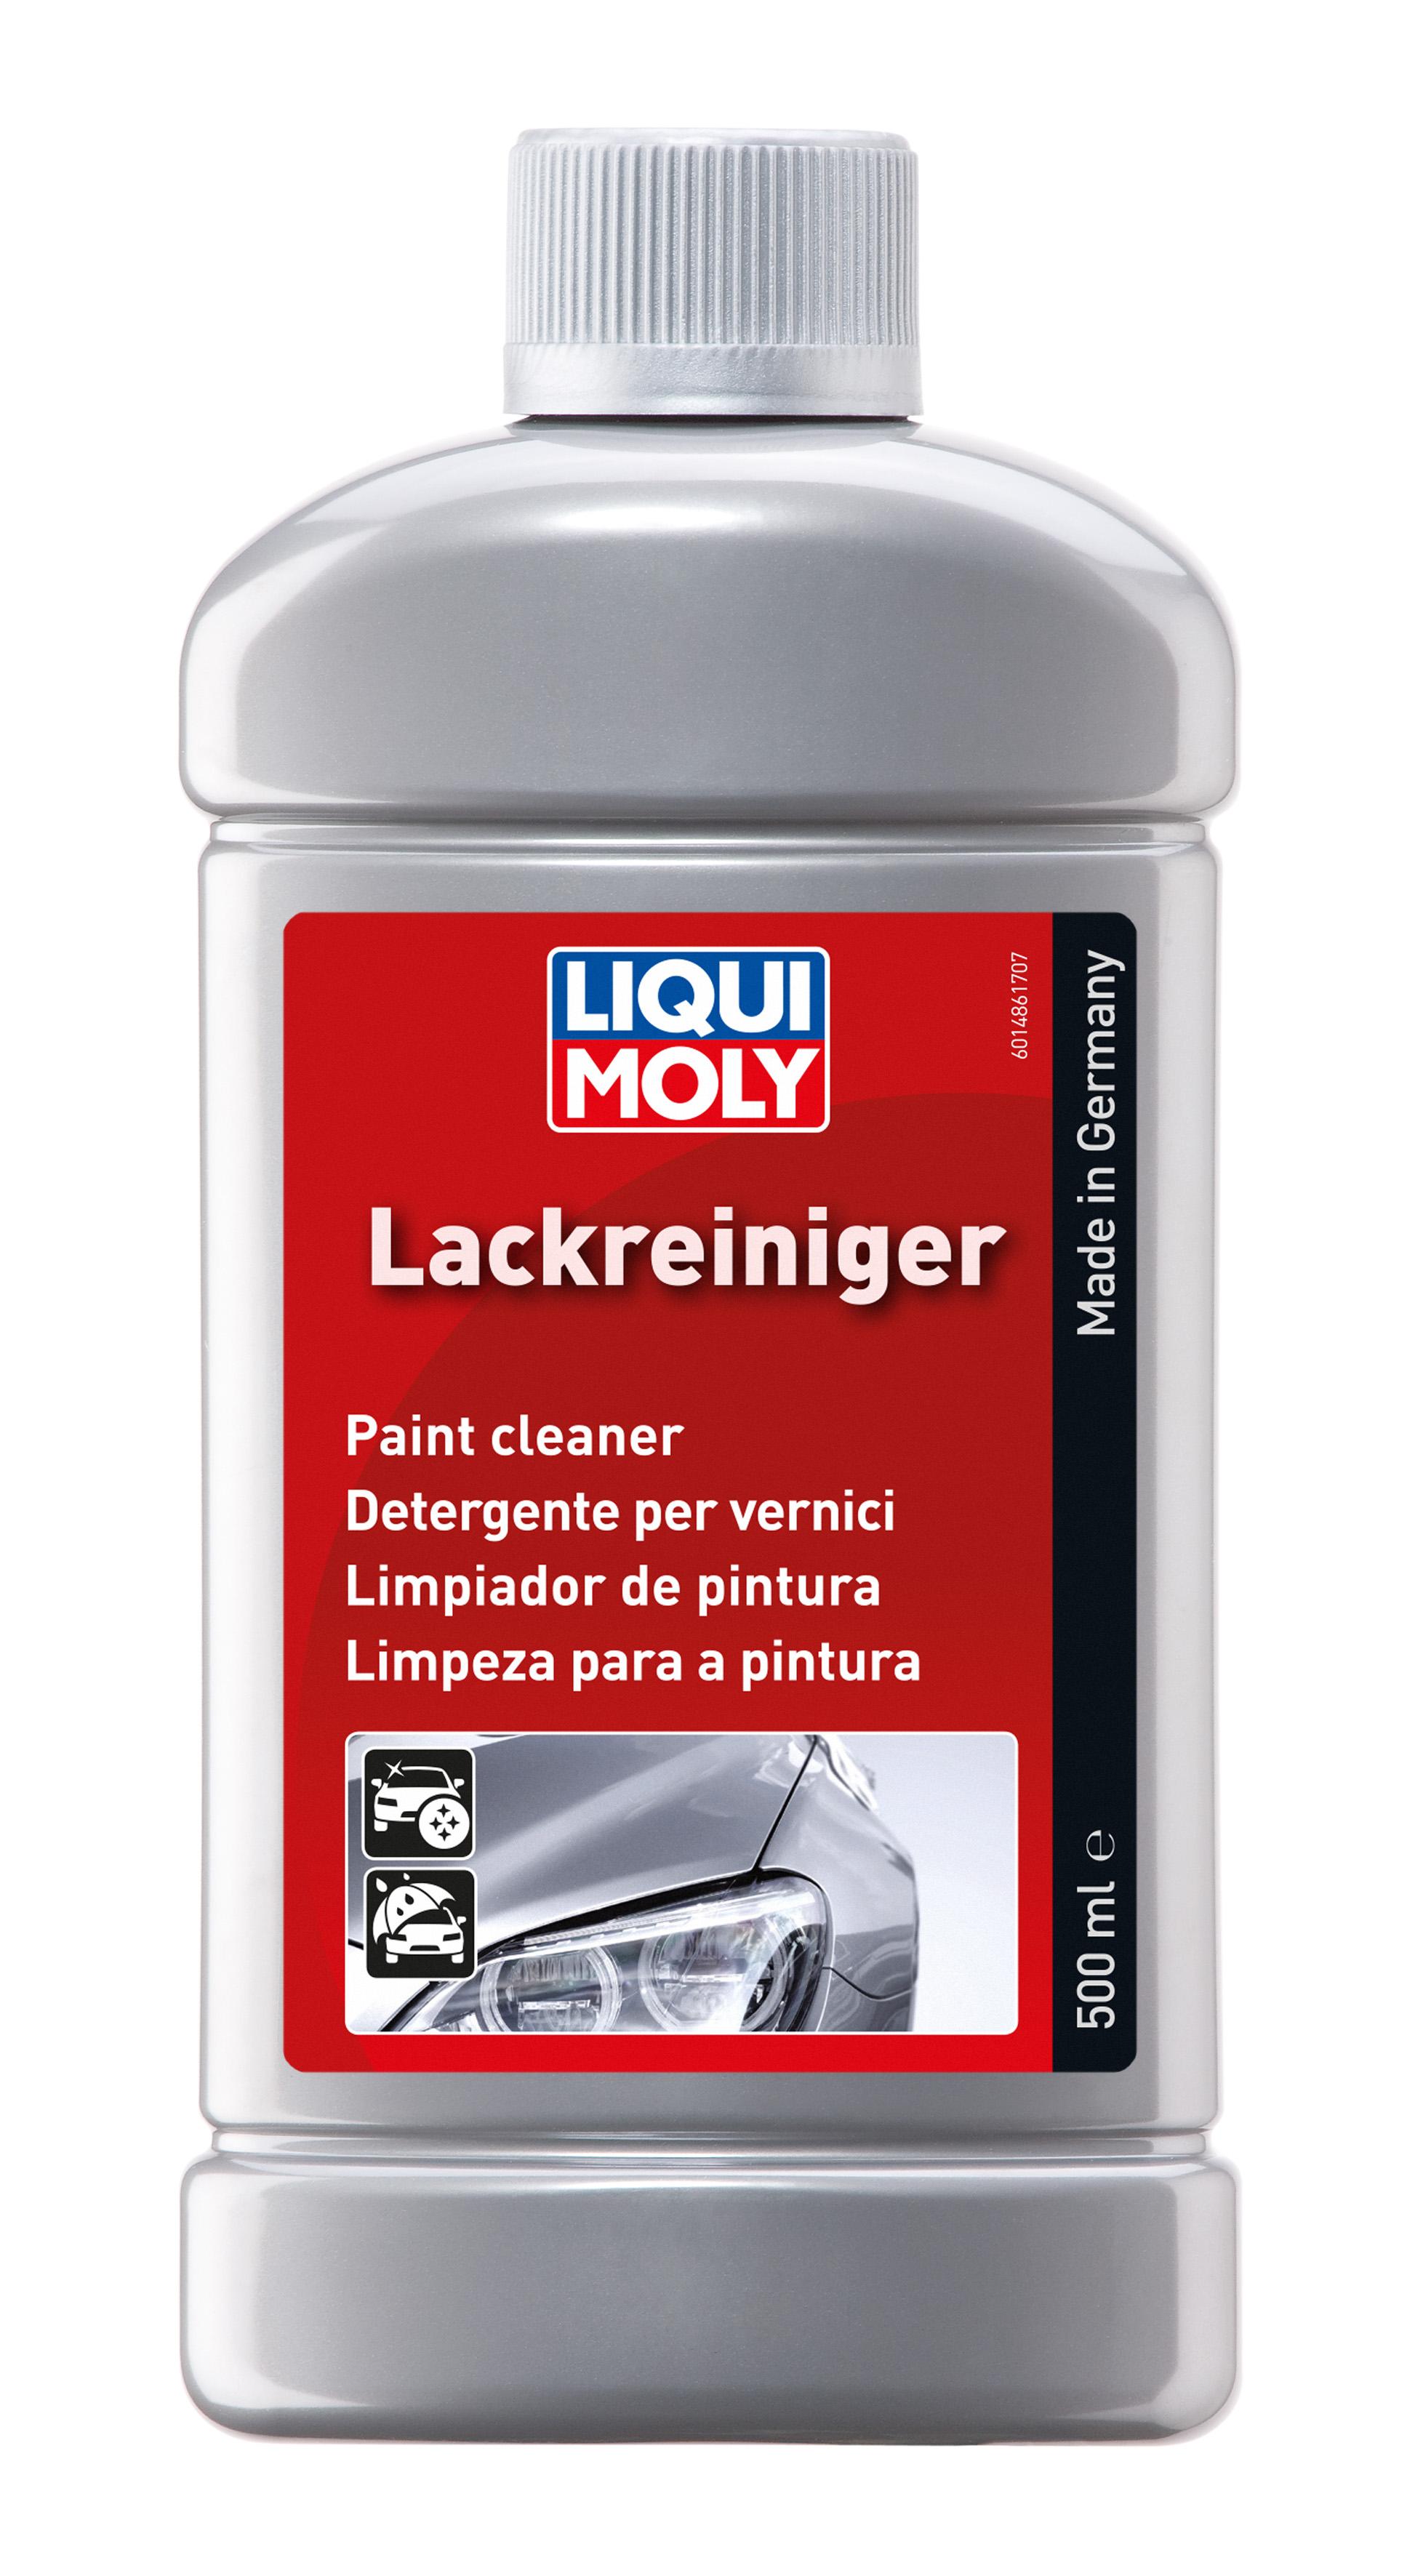 LIQUI MOLY Lackreiniger, 500ml